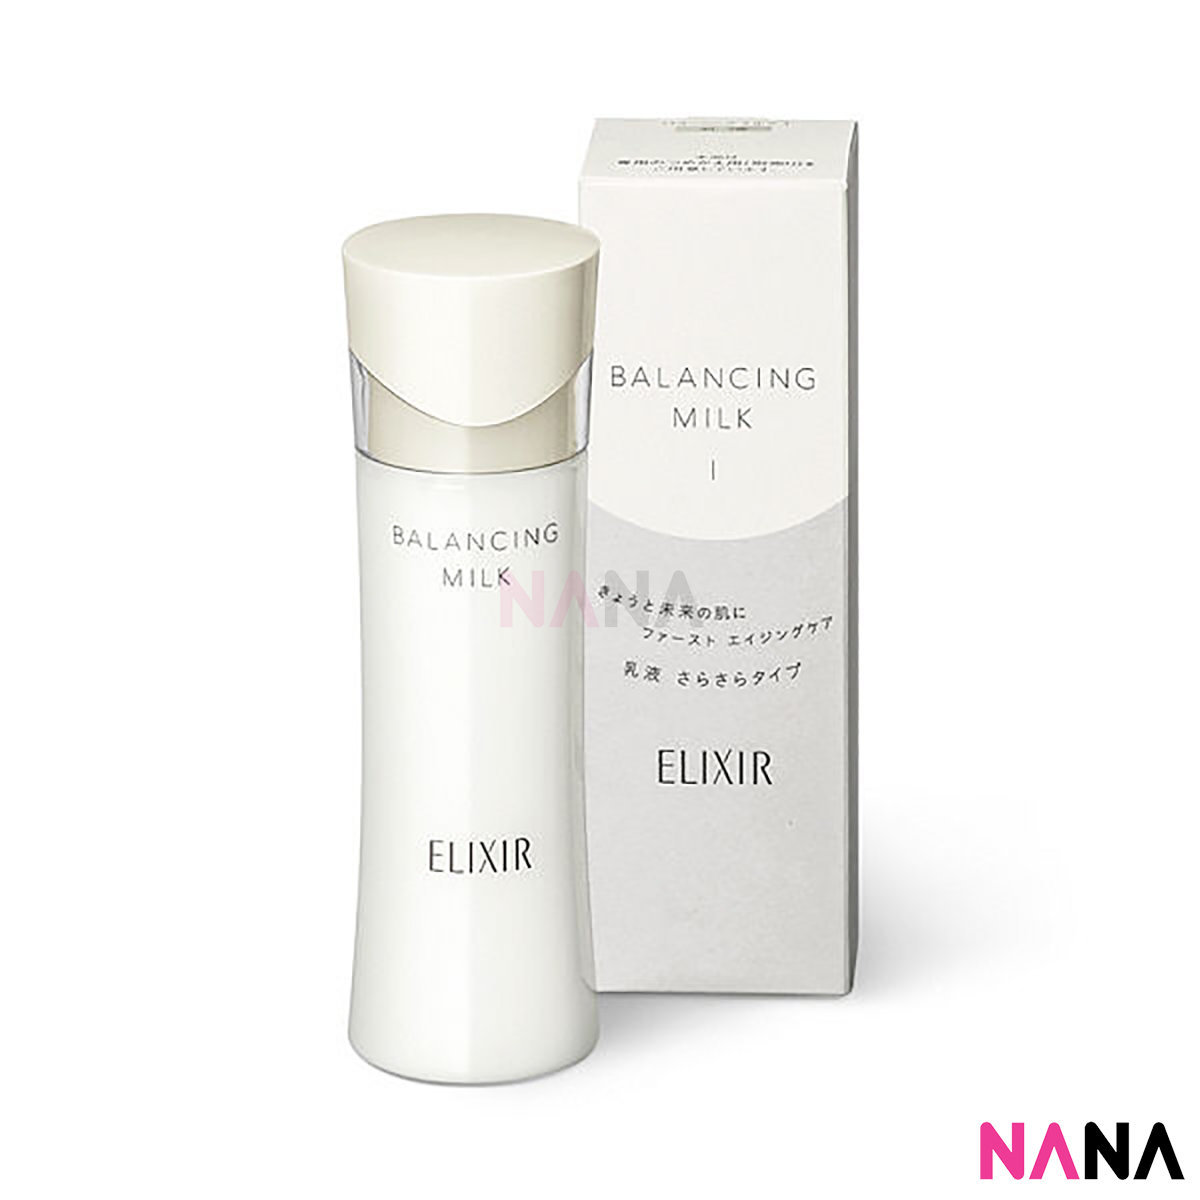 Elixir Balancing Milk I (Refreshing) 130ml